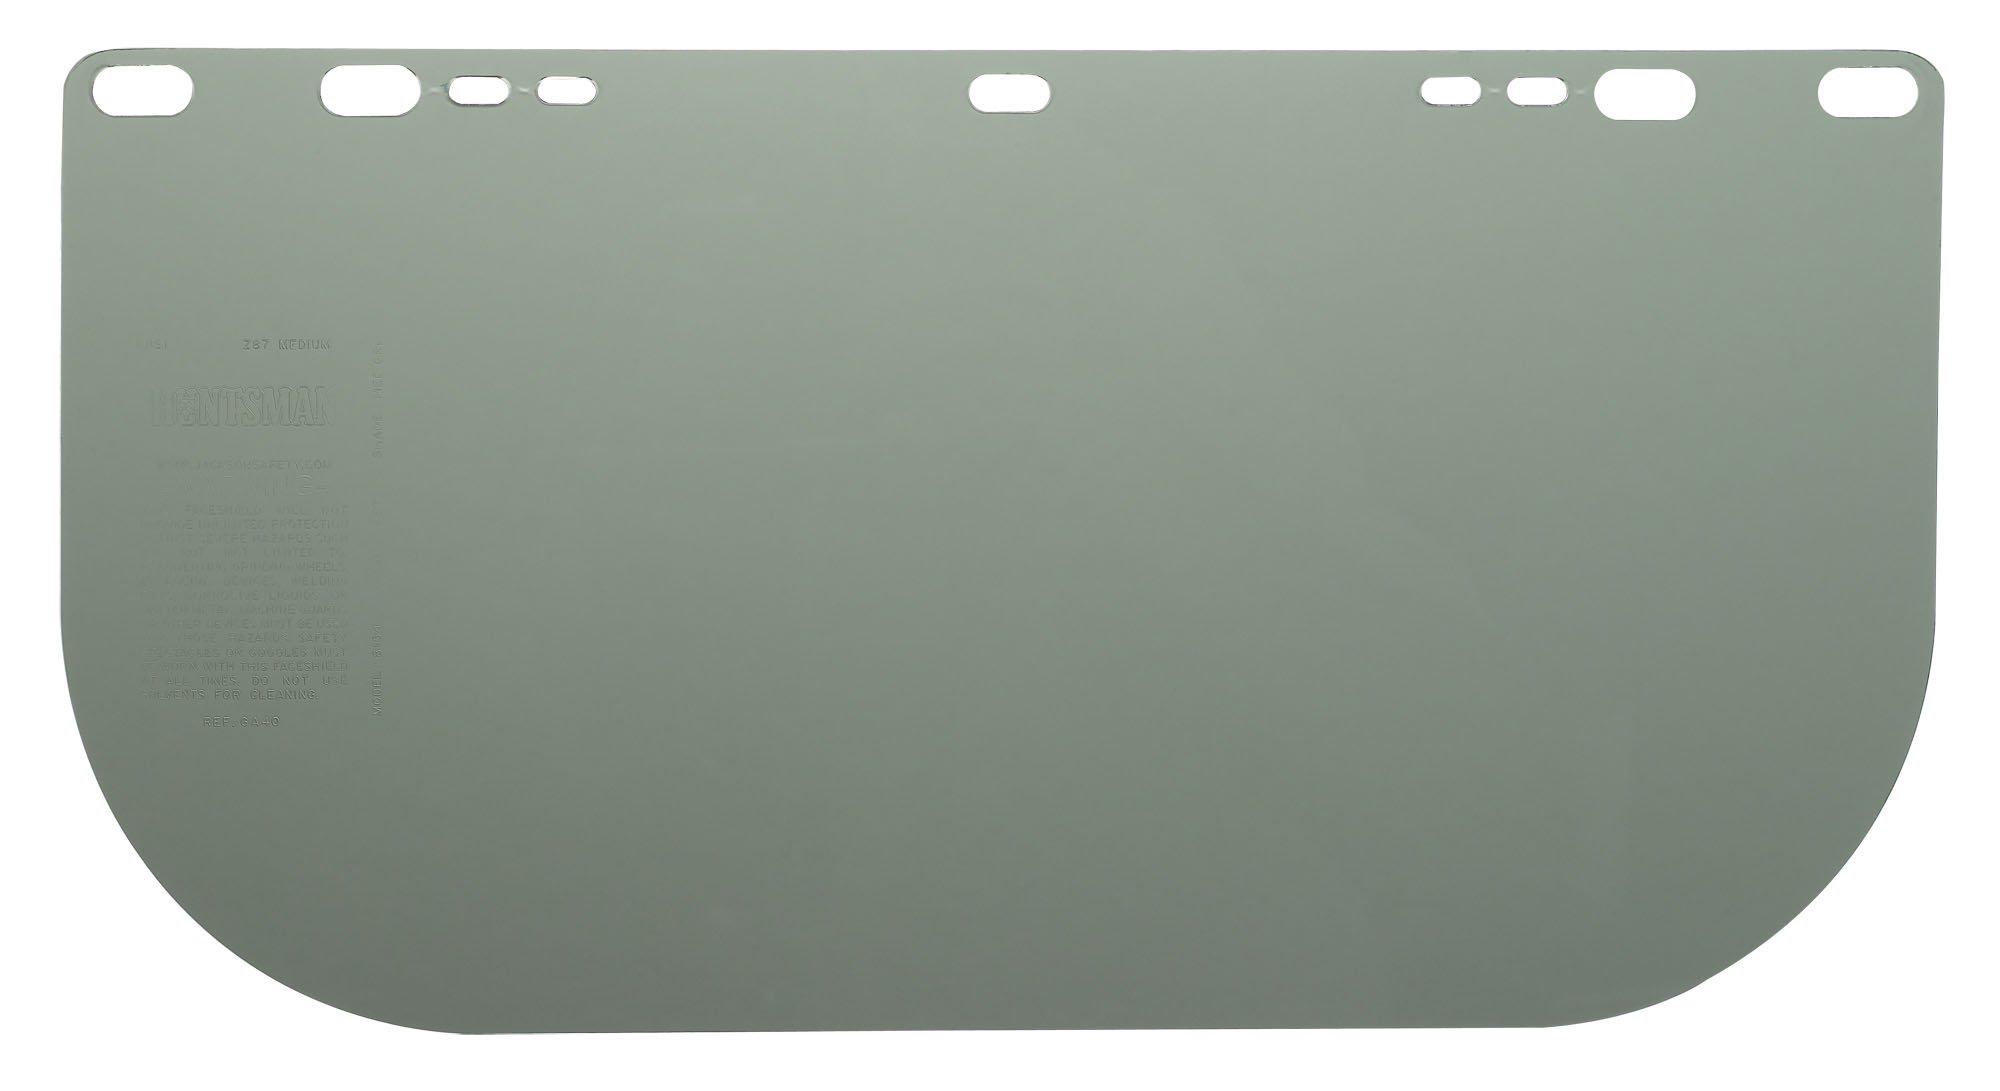 Jackson Safety F10 Polyethylene Terephthalate Aluminum Bound Face Shield, 15-1/2'' Length x 9'' Width x 0.040'' Thick, Medium Green (Case of 36)